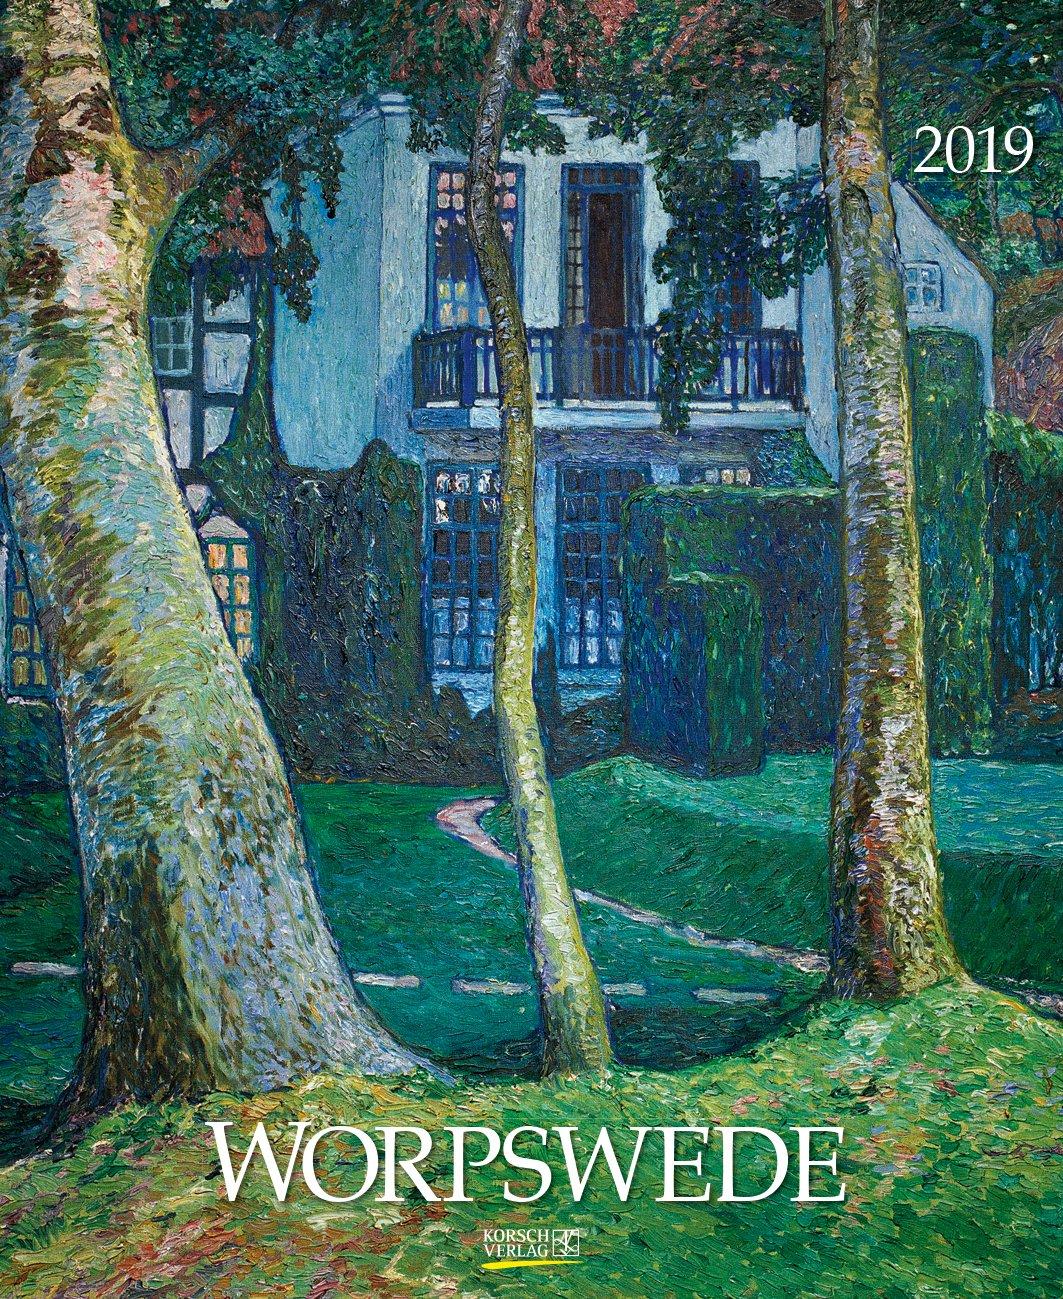 Foliendeckblatt Wandkalender mit detailgetreuen Worpswede 204019 2019: Gro/ßer Kunstkalender charmanten Werken Format: 45,5 x 55 cm